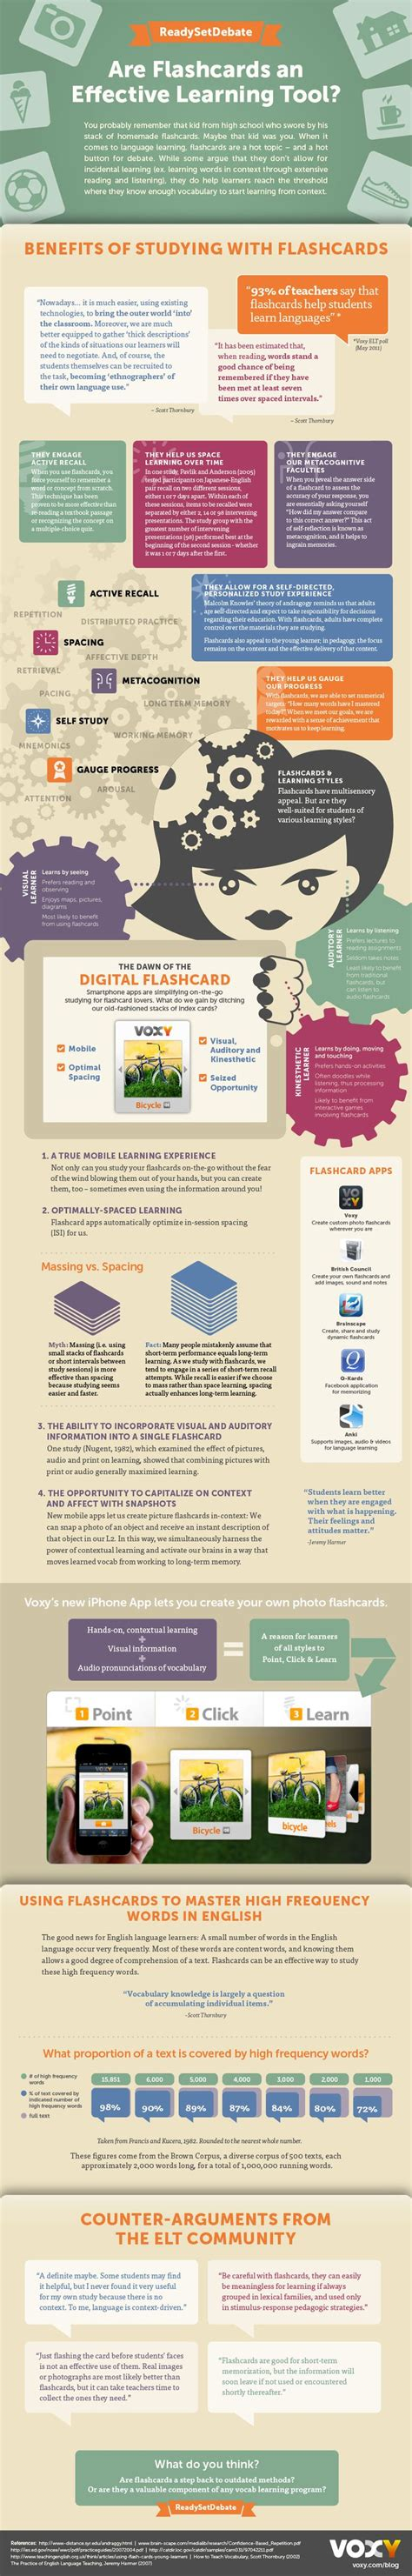 design thinking quizlet 253 best images about instructional design on pinterest